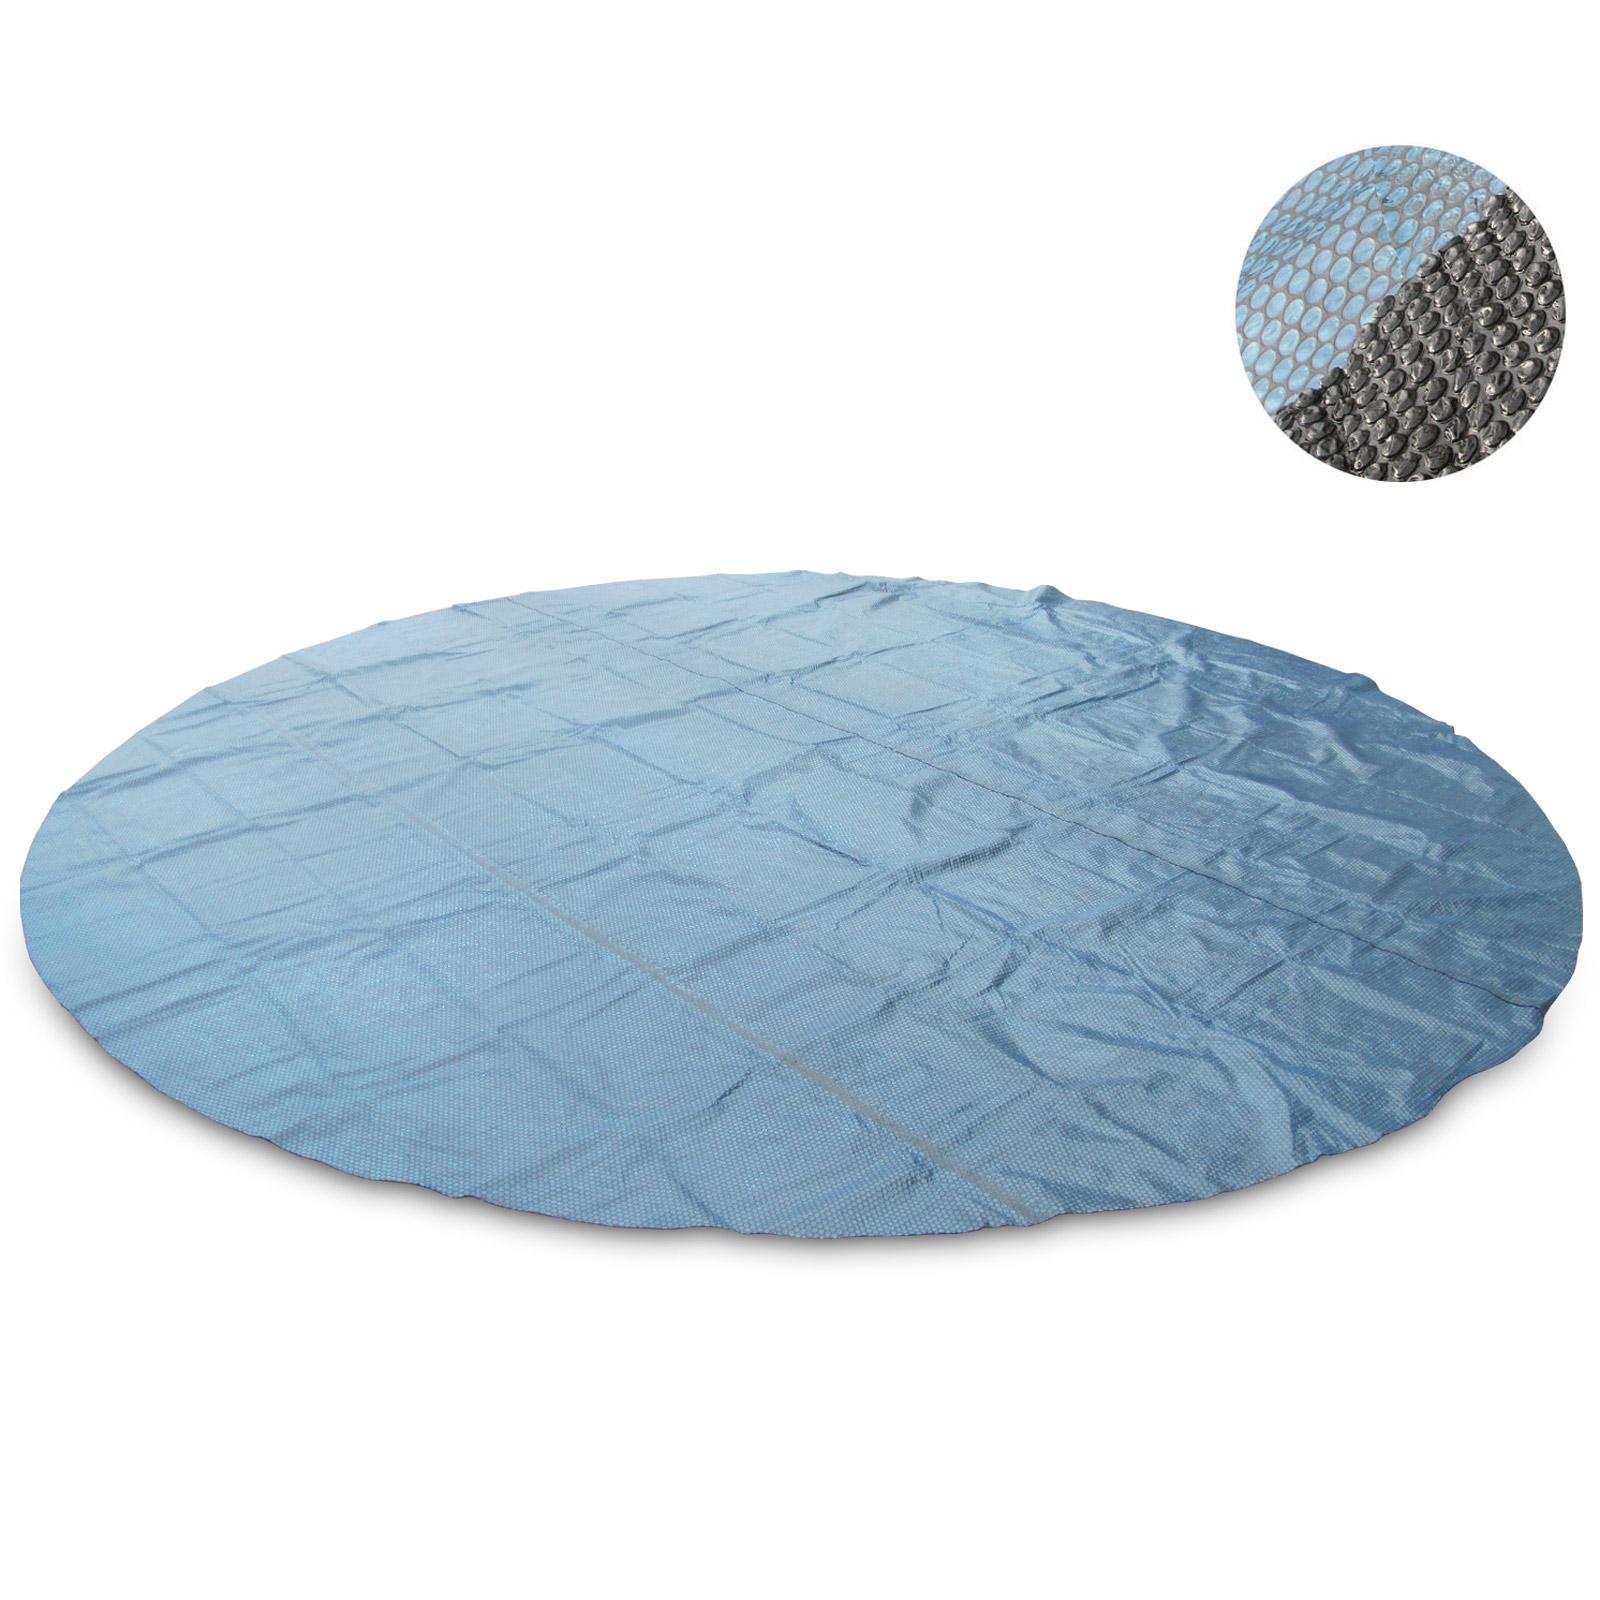 Intex 457x122 cm mit pumpe schwimmbecken swimming pool for Gunstige pools mit pumpe